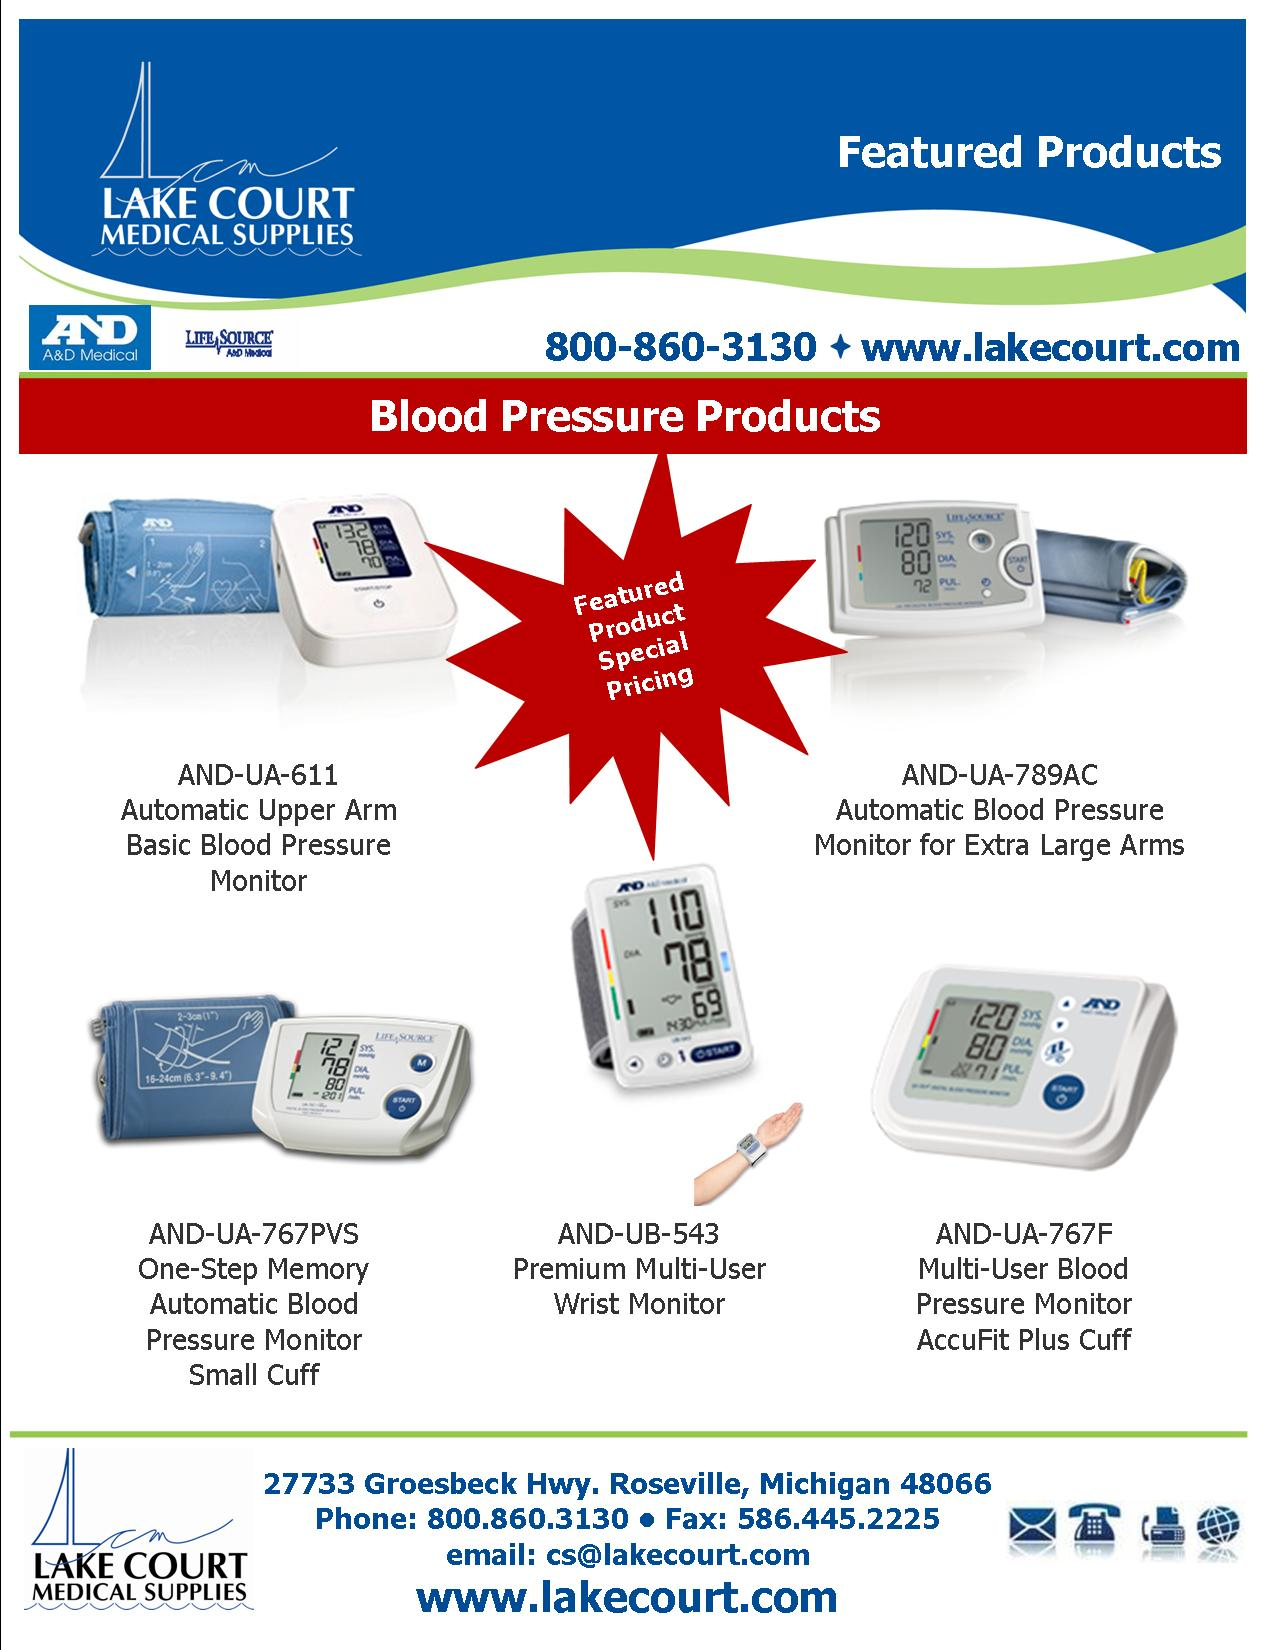 Discount medical supplies coupon code